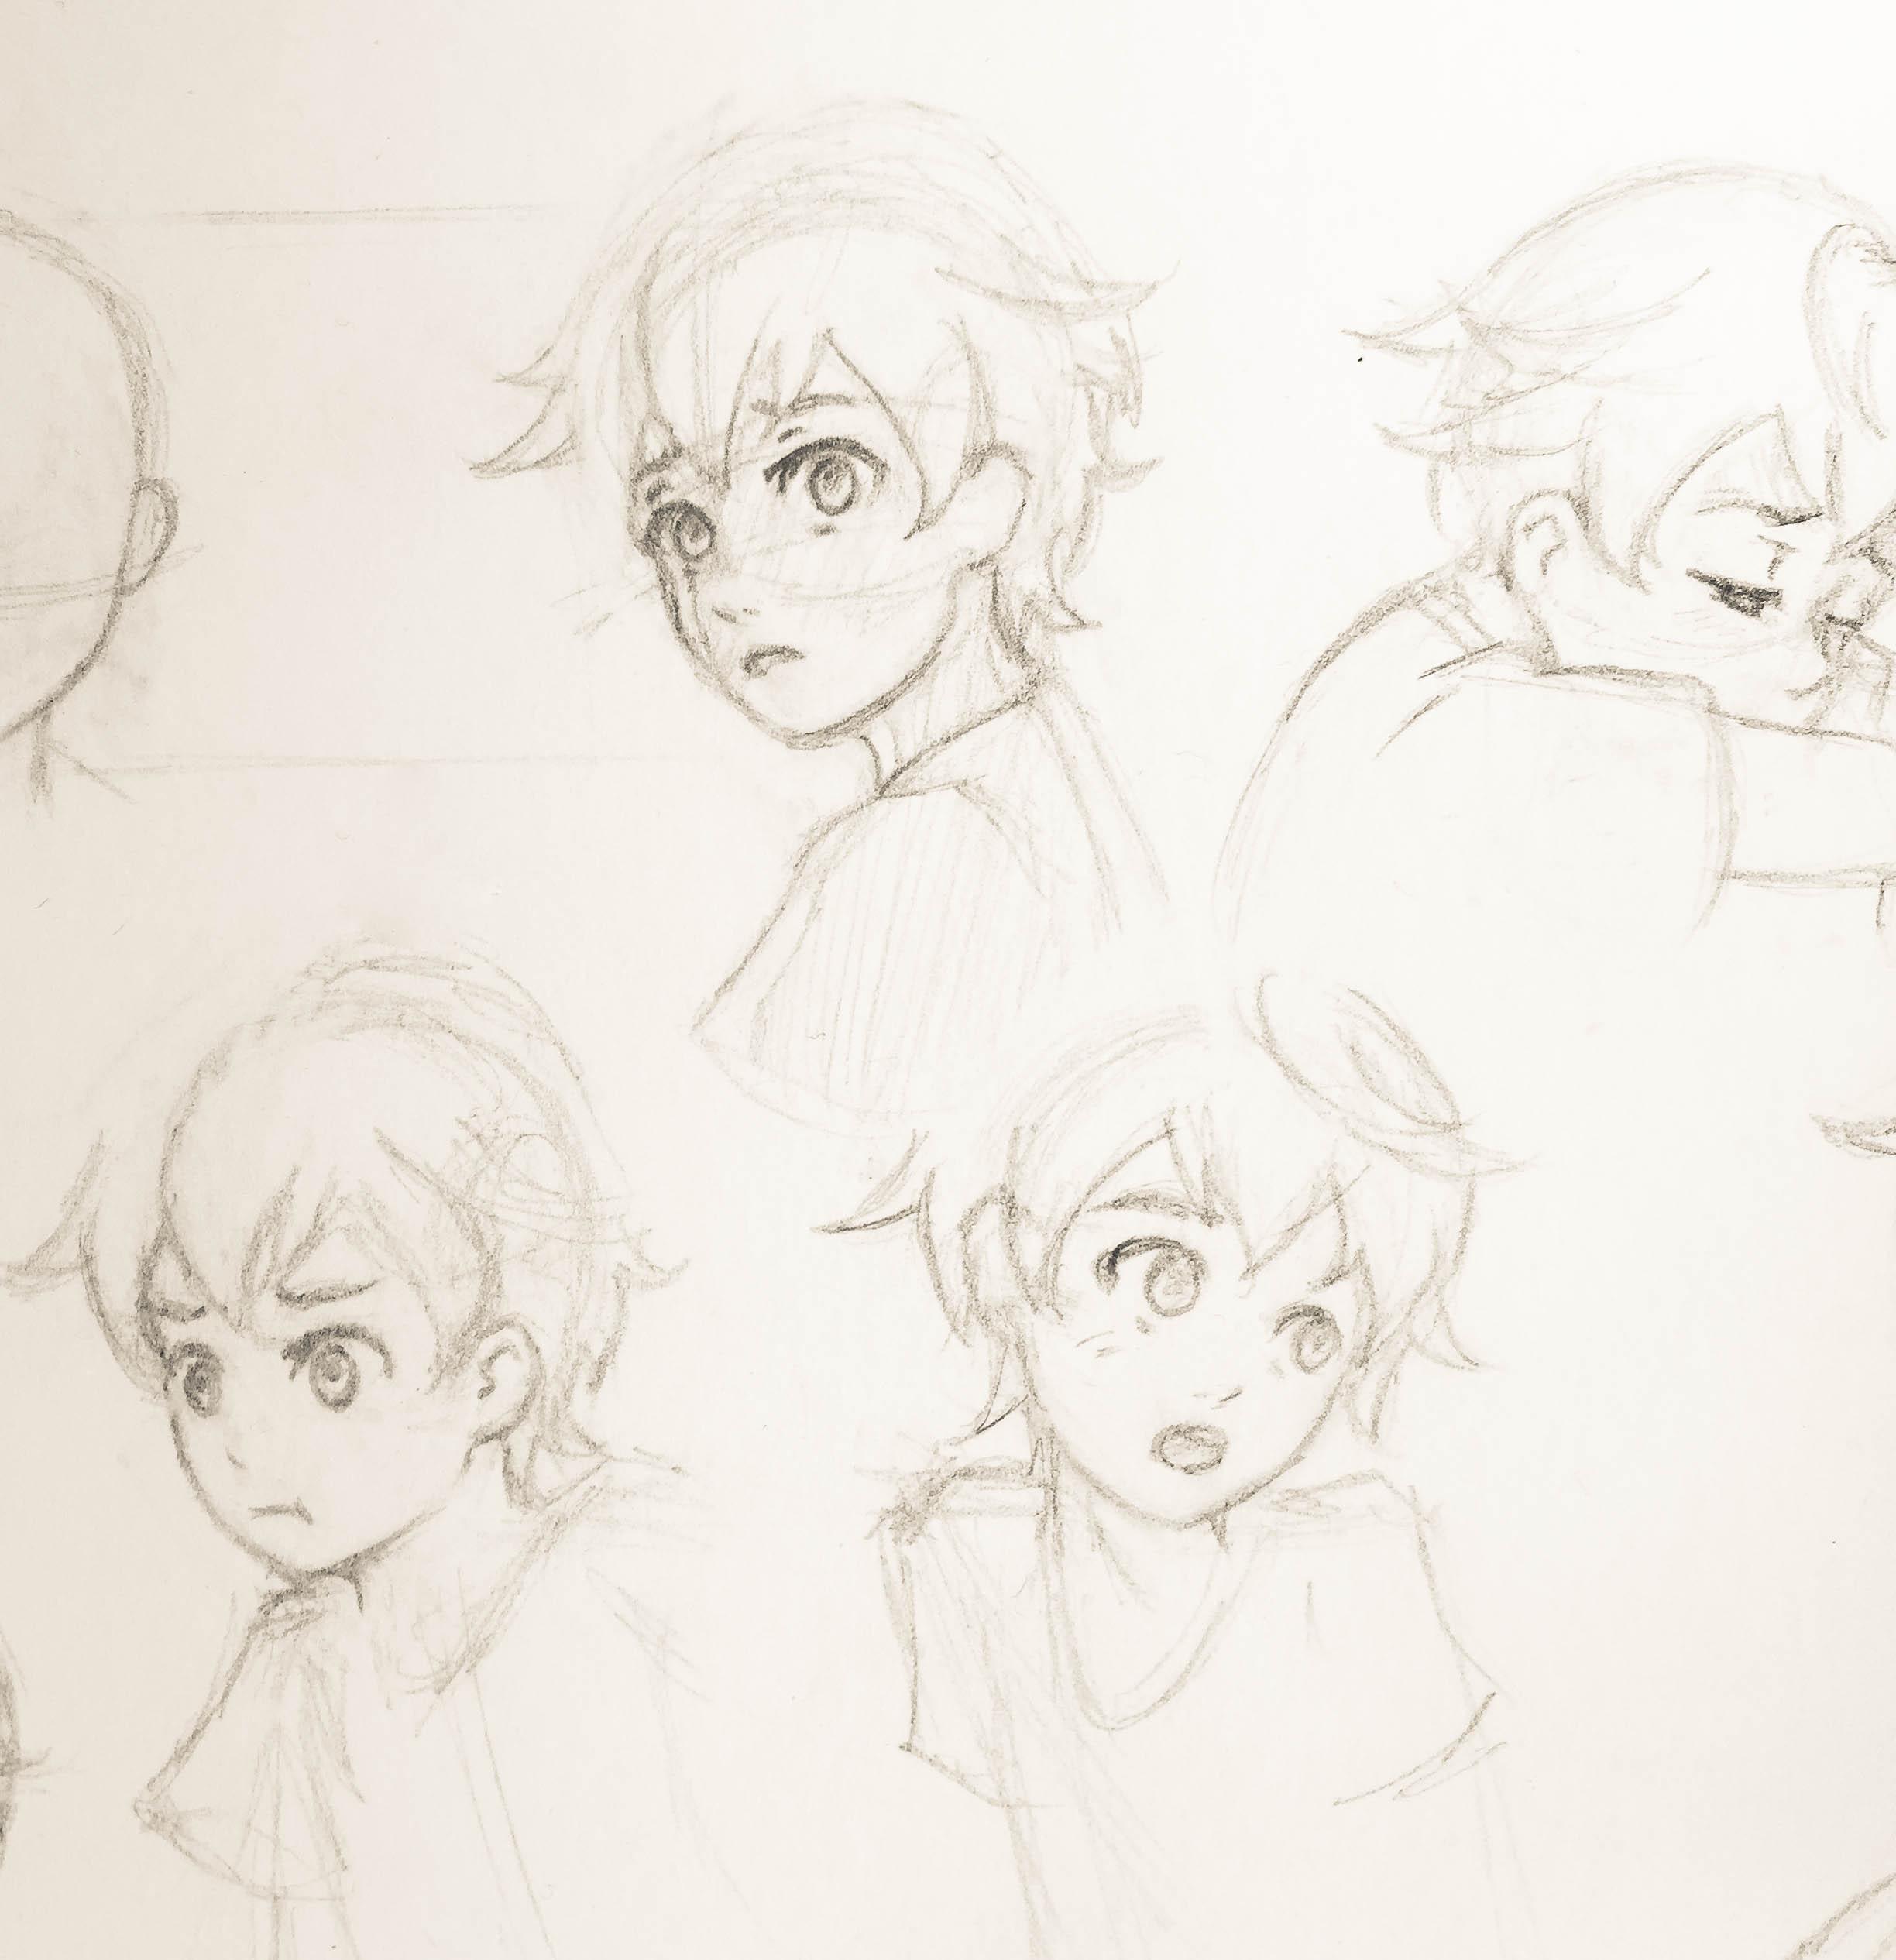 Ryuu Character Designs